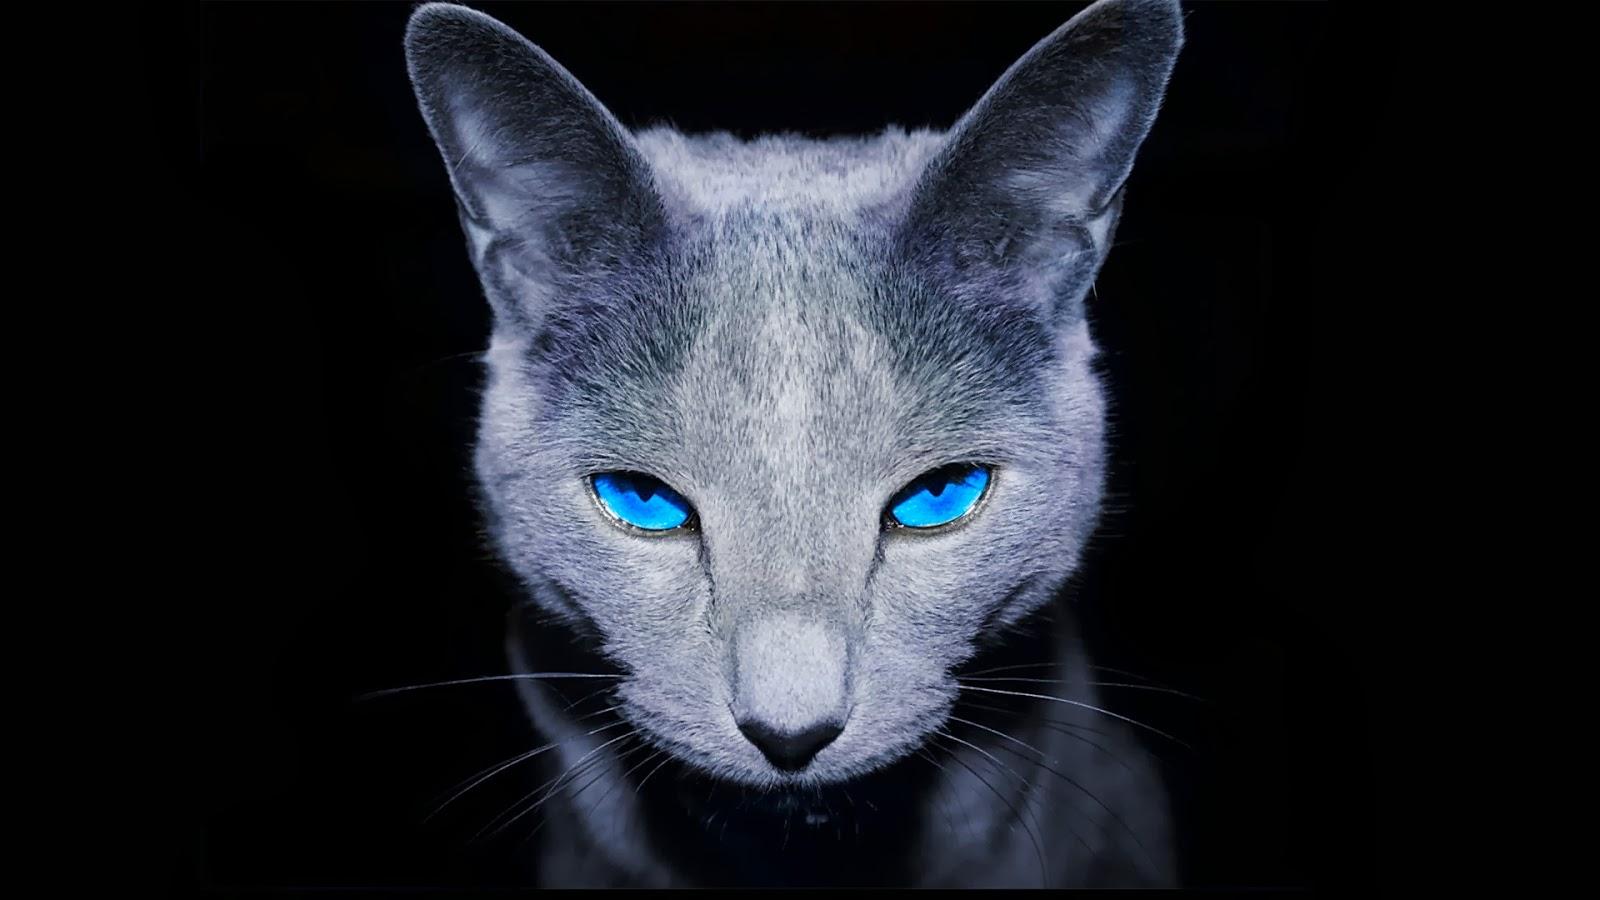 blue eyes wallpaper 2048x1152 - photo #6